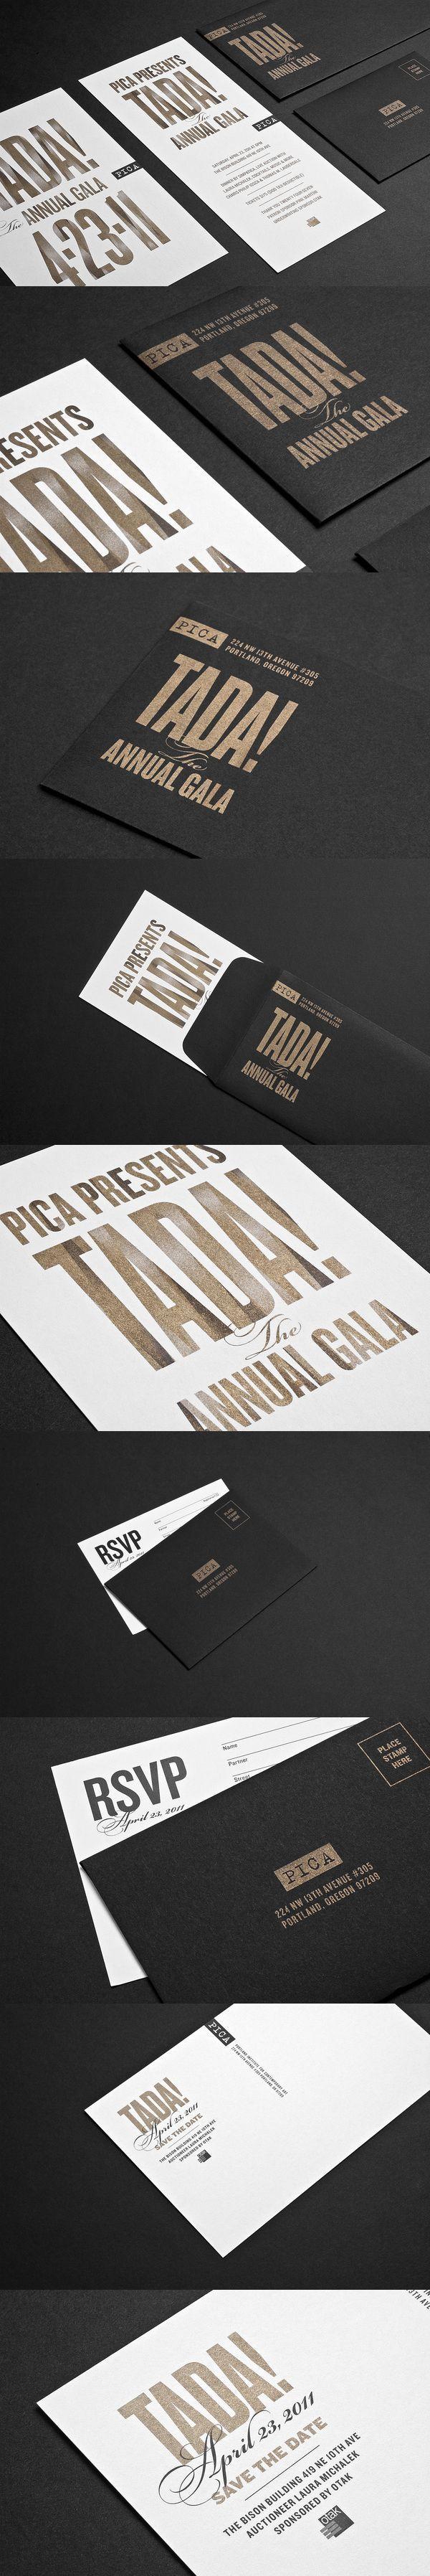 Print design inspiration   #976